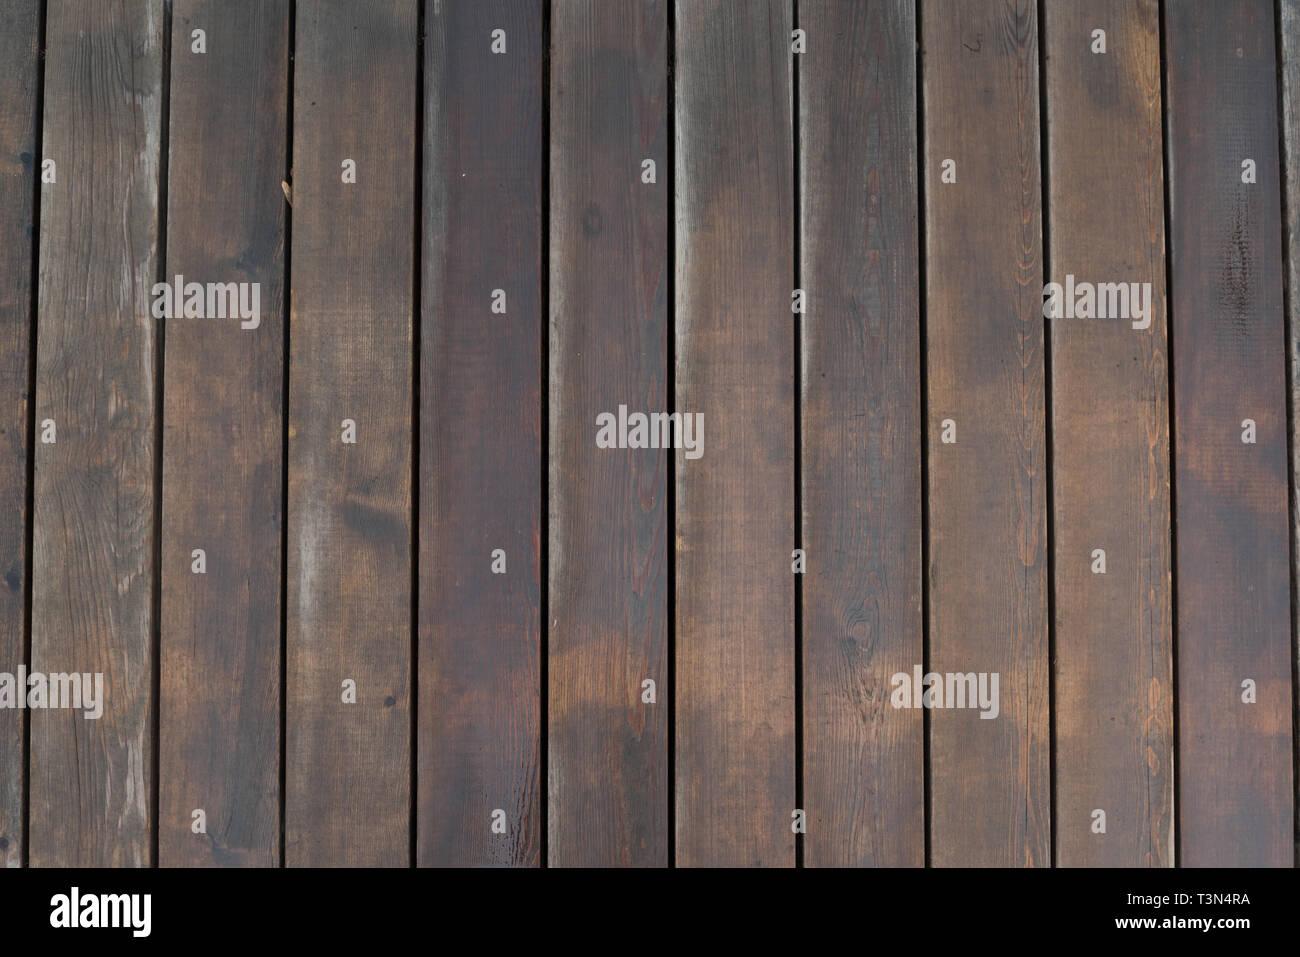 Background of wet wooden boards. Textured floor on top view. - Stock Image